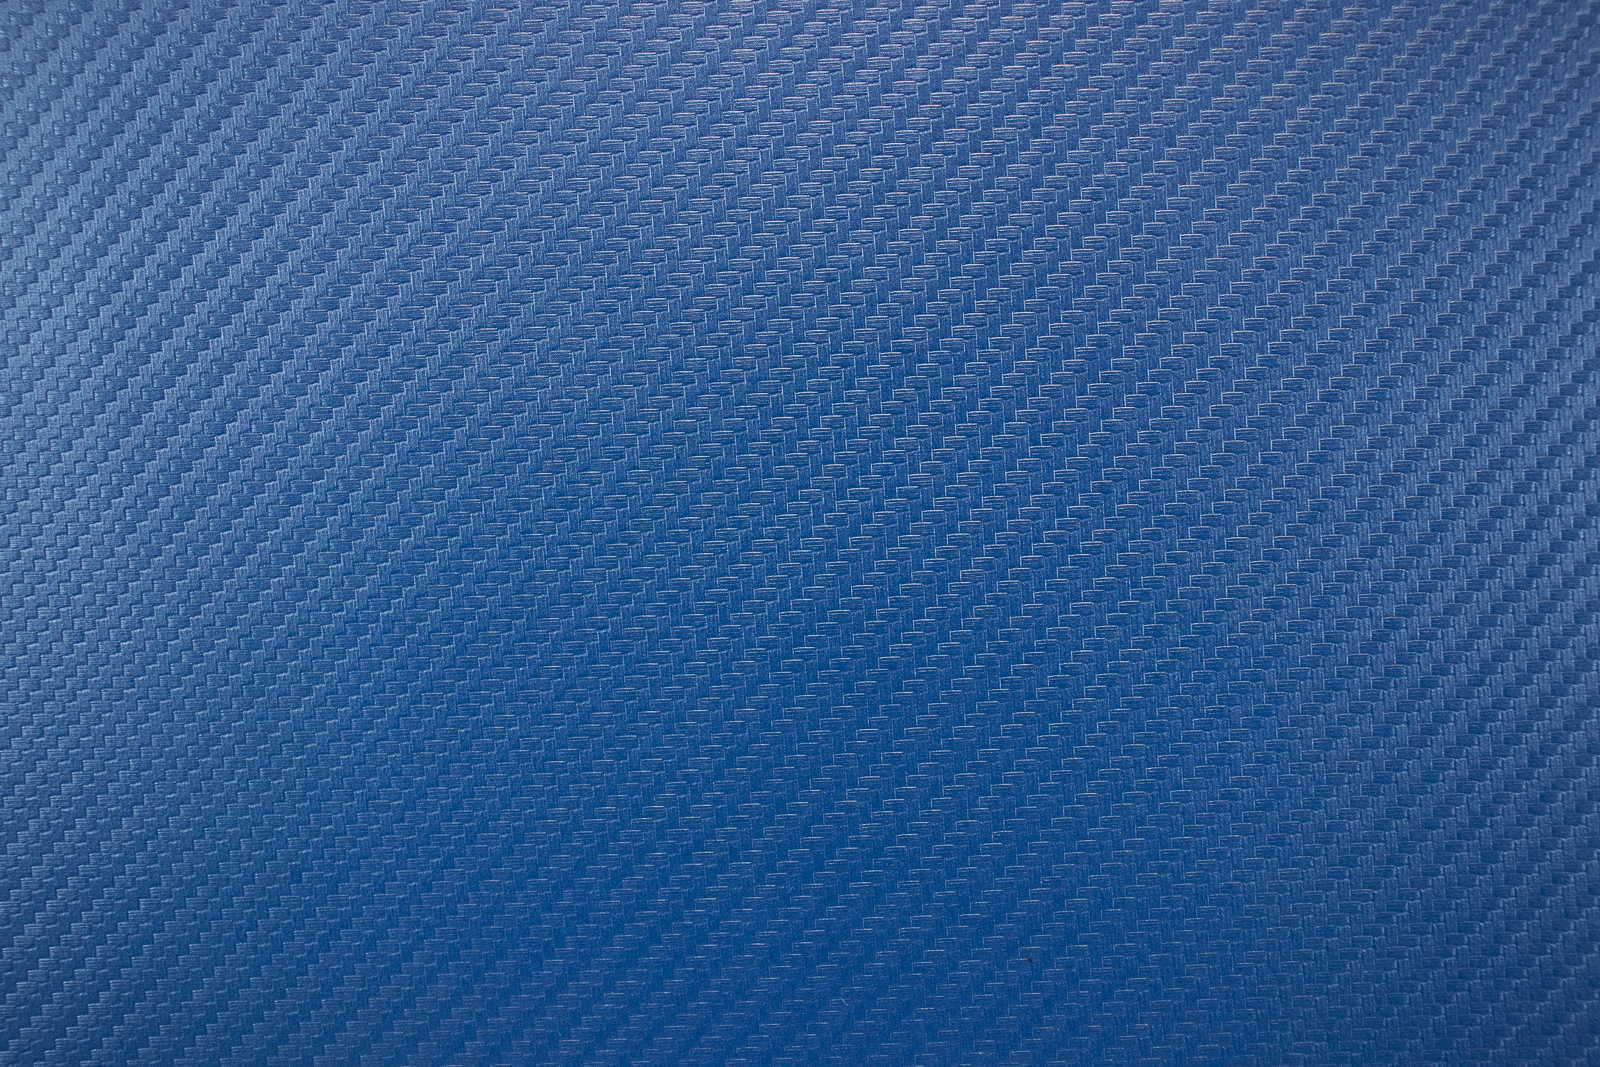 Tortuga Marine Upholstery Vinyl Fabric Boat Seats Outdoor